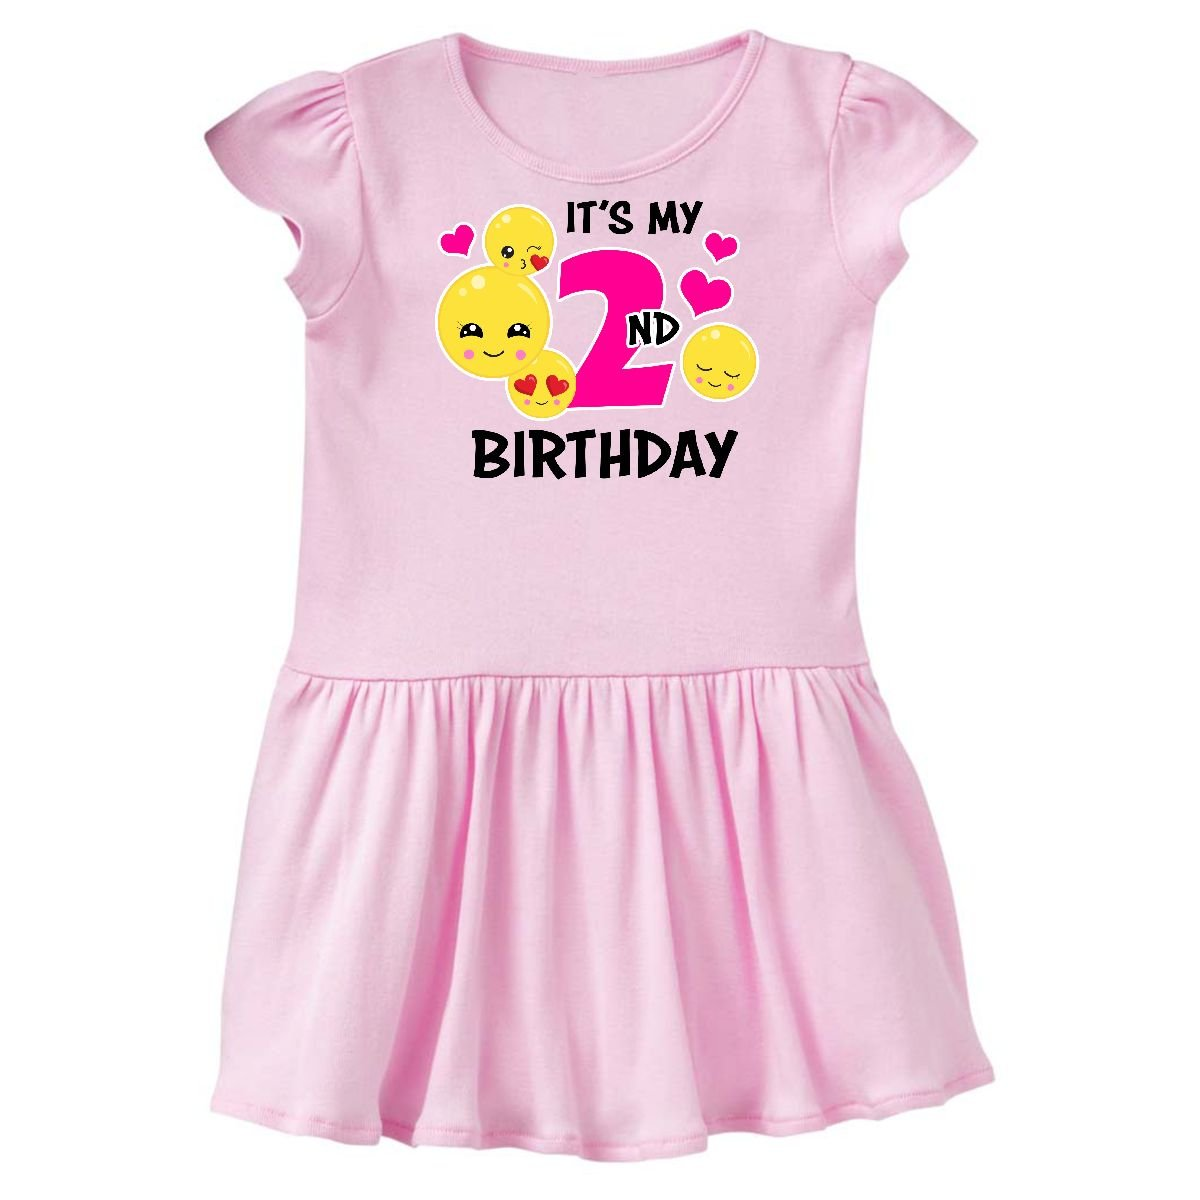 inktastic - Its My 2nd Birthday with Emojis Infant Dress 14-196255-197